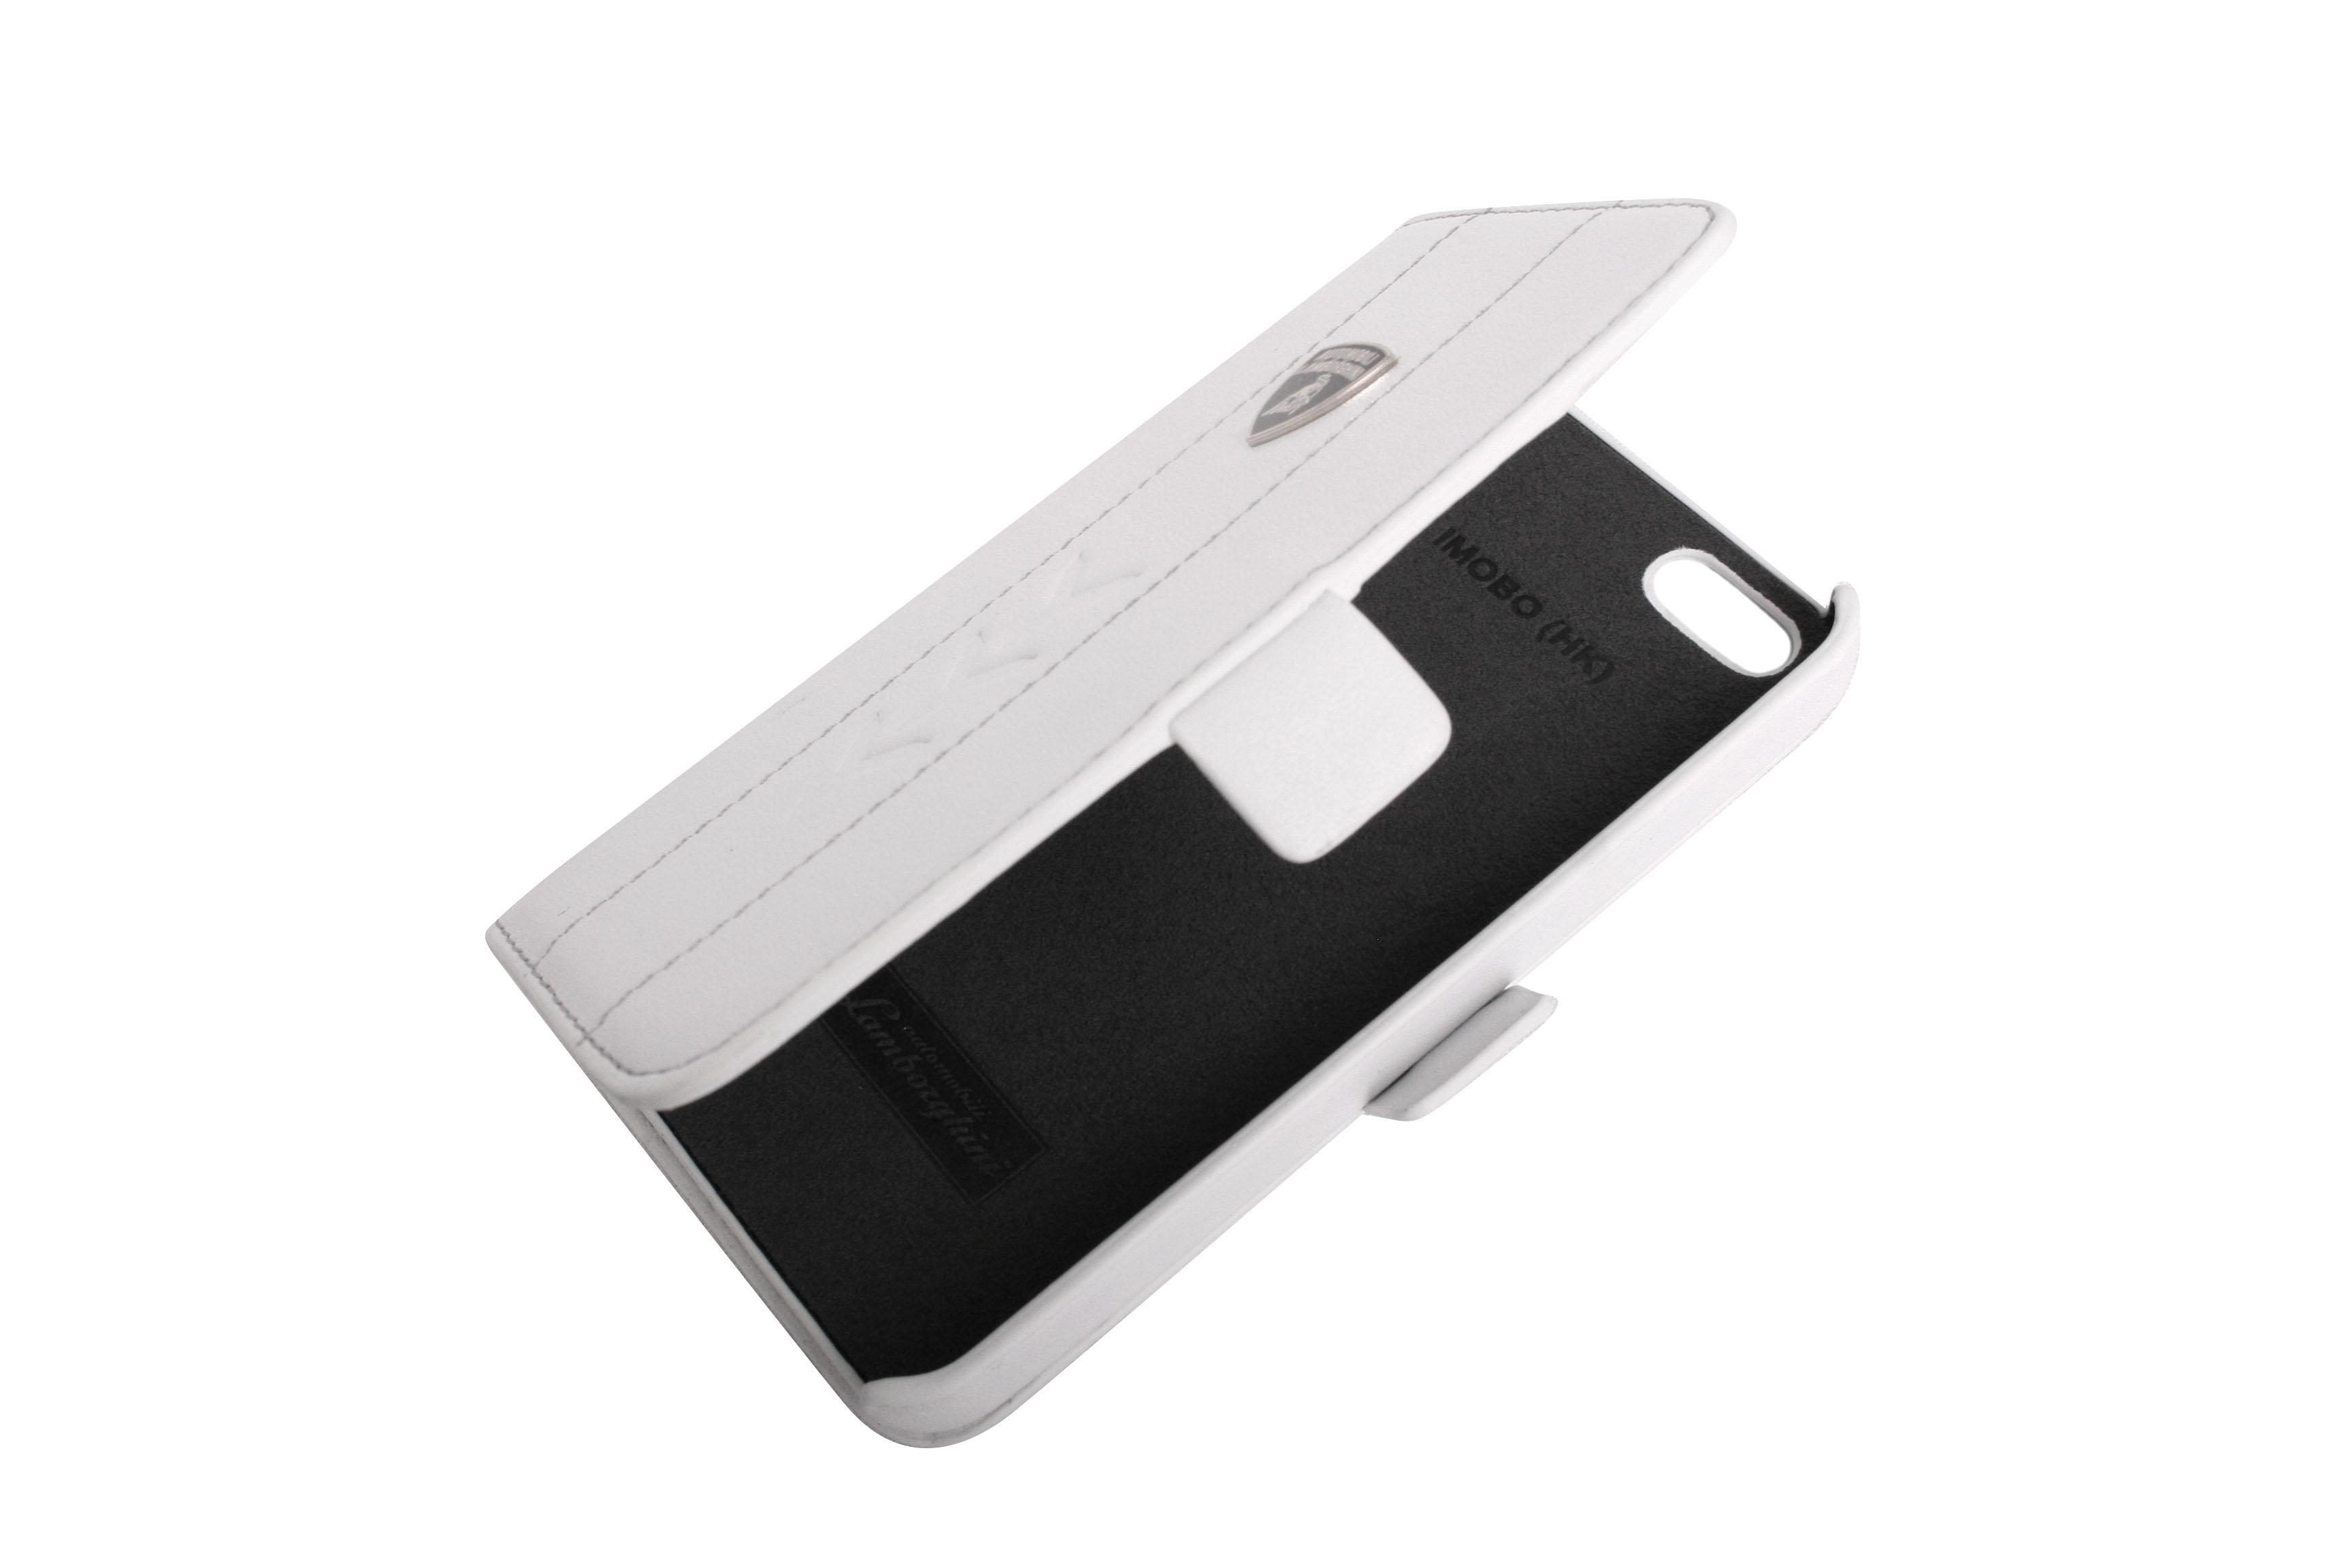 чехол для iphone 5/5s ламборджини